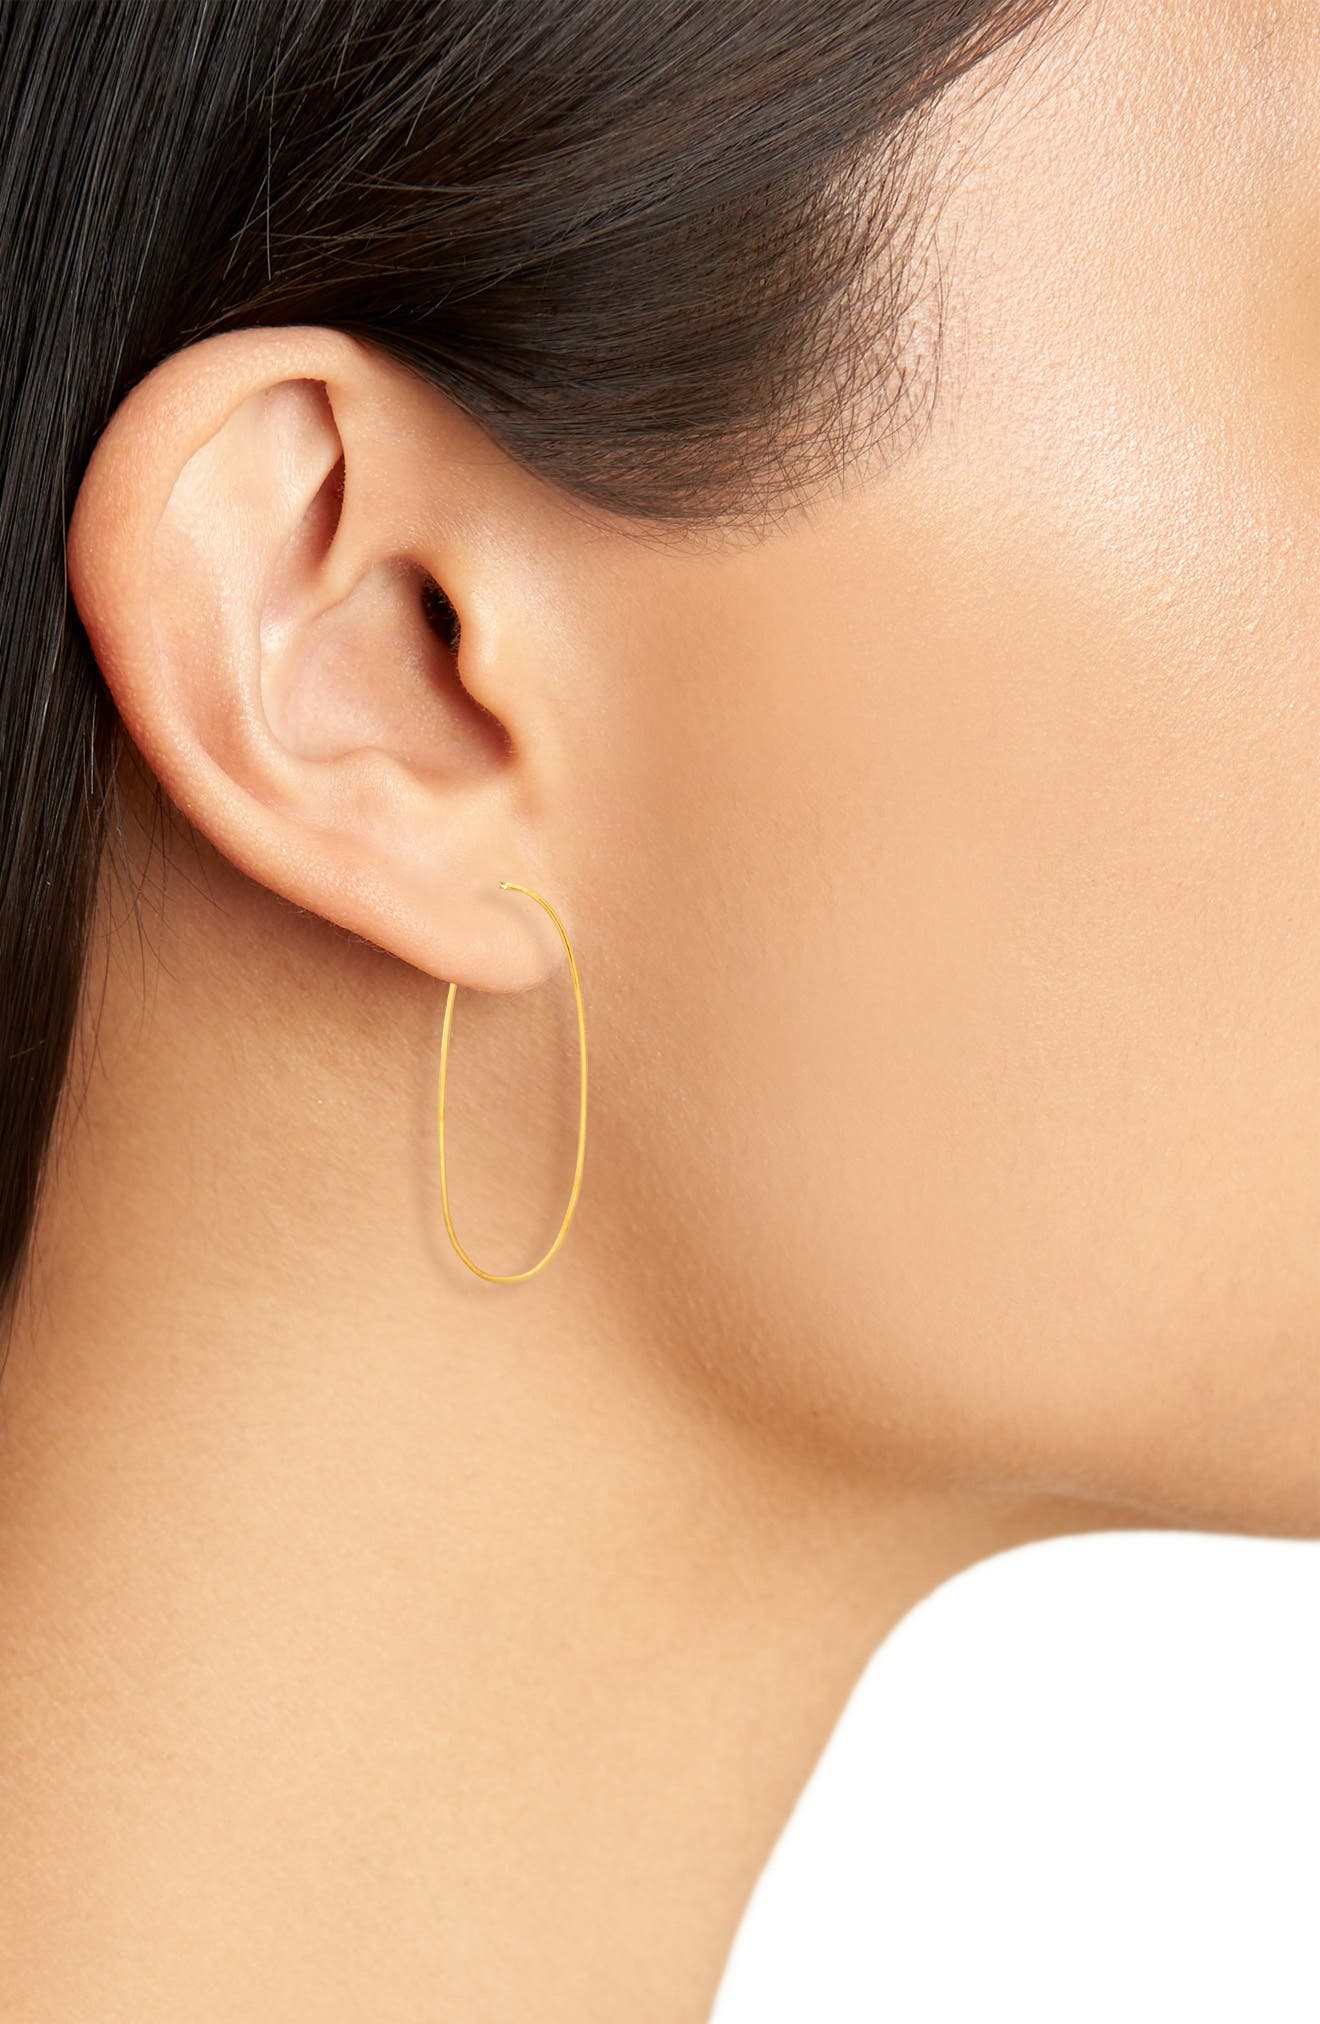 Flat Long Oval Hoop Earrings,                             Alternate thumbnail 2, color,                             YELLOW GOLD